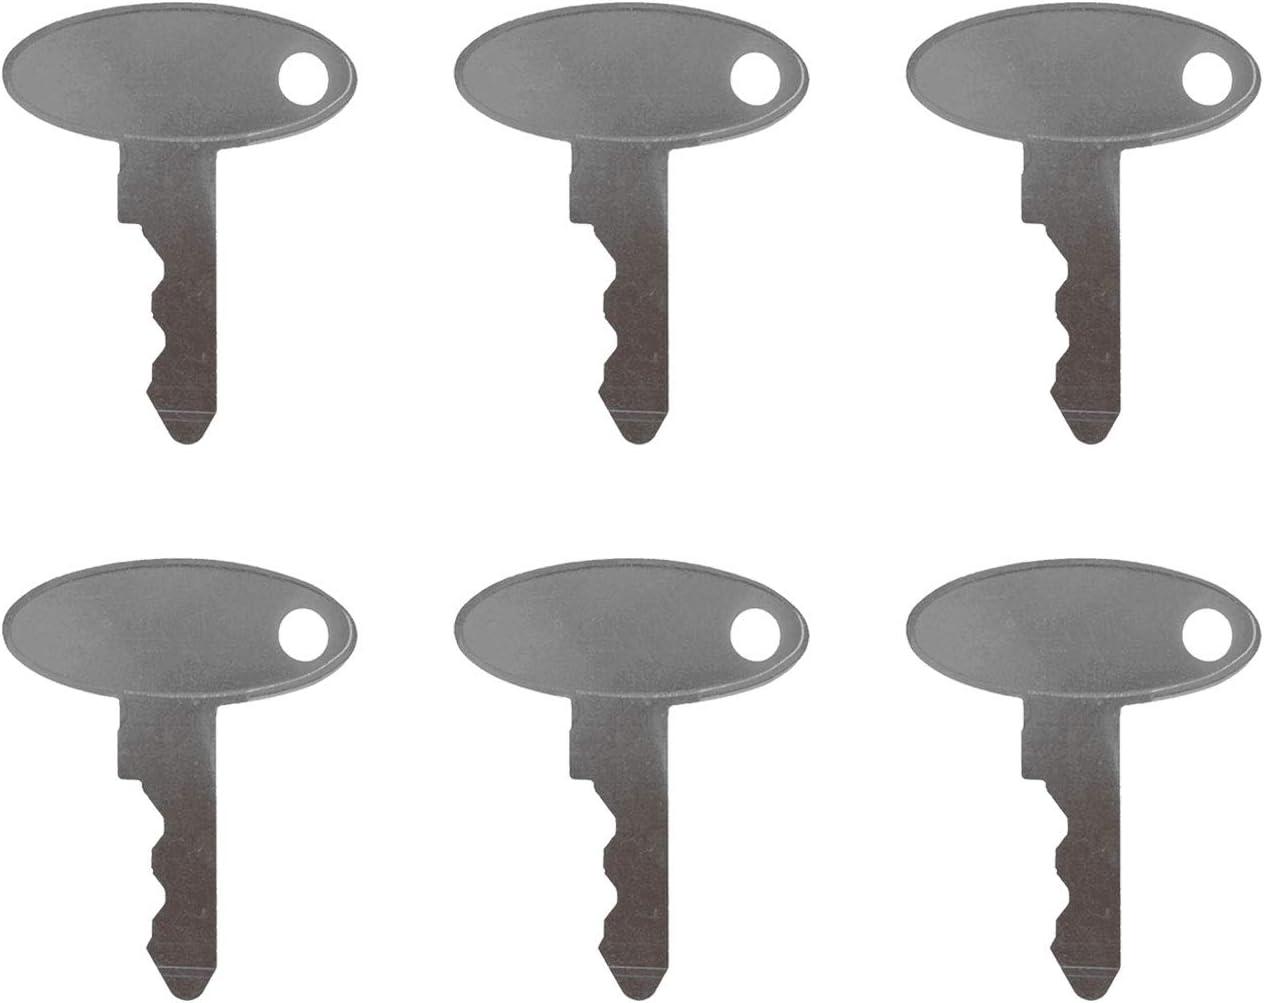 Ignition Keys 1570 for Ford New Holland Tractors TC25 TC29 TC30 TC33 L554 L565 LS140 LS150 LS170 2120 1925 1920 1752 1720 1715 1630 1620 1530 1520 1320 1300 1210 Weelparz ELI80-0089 6